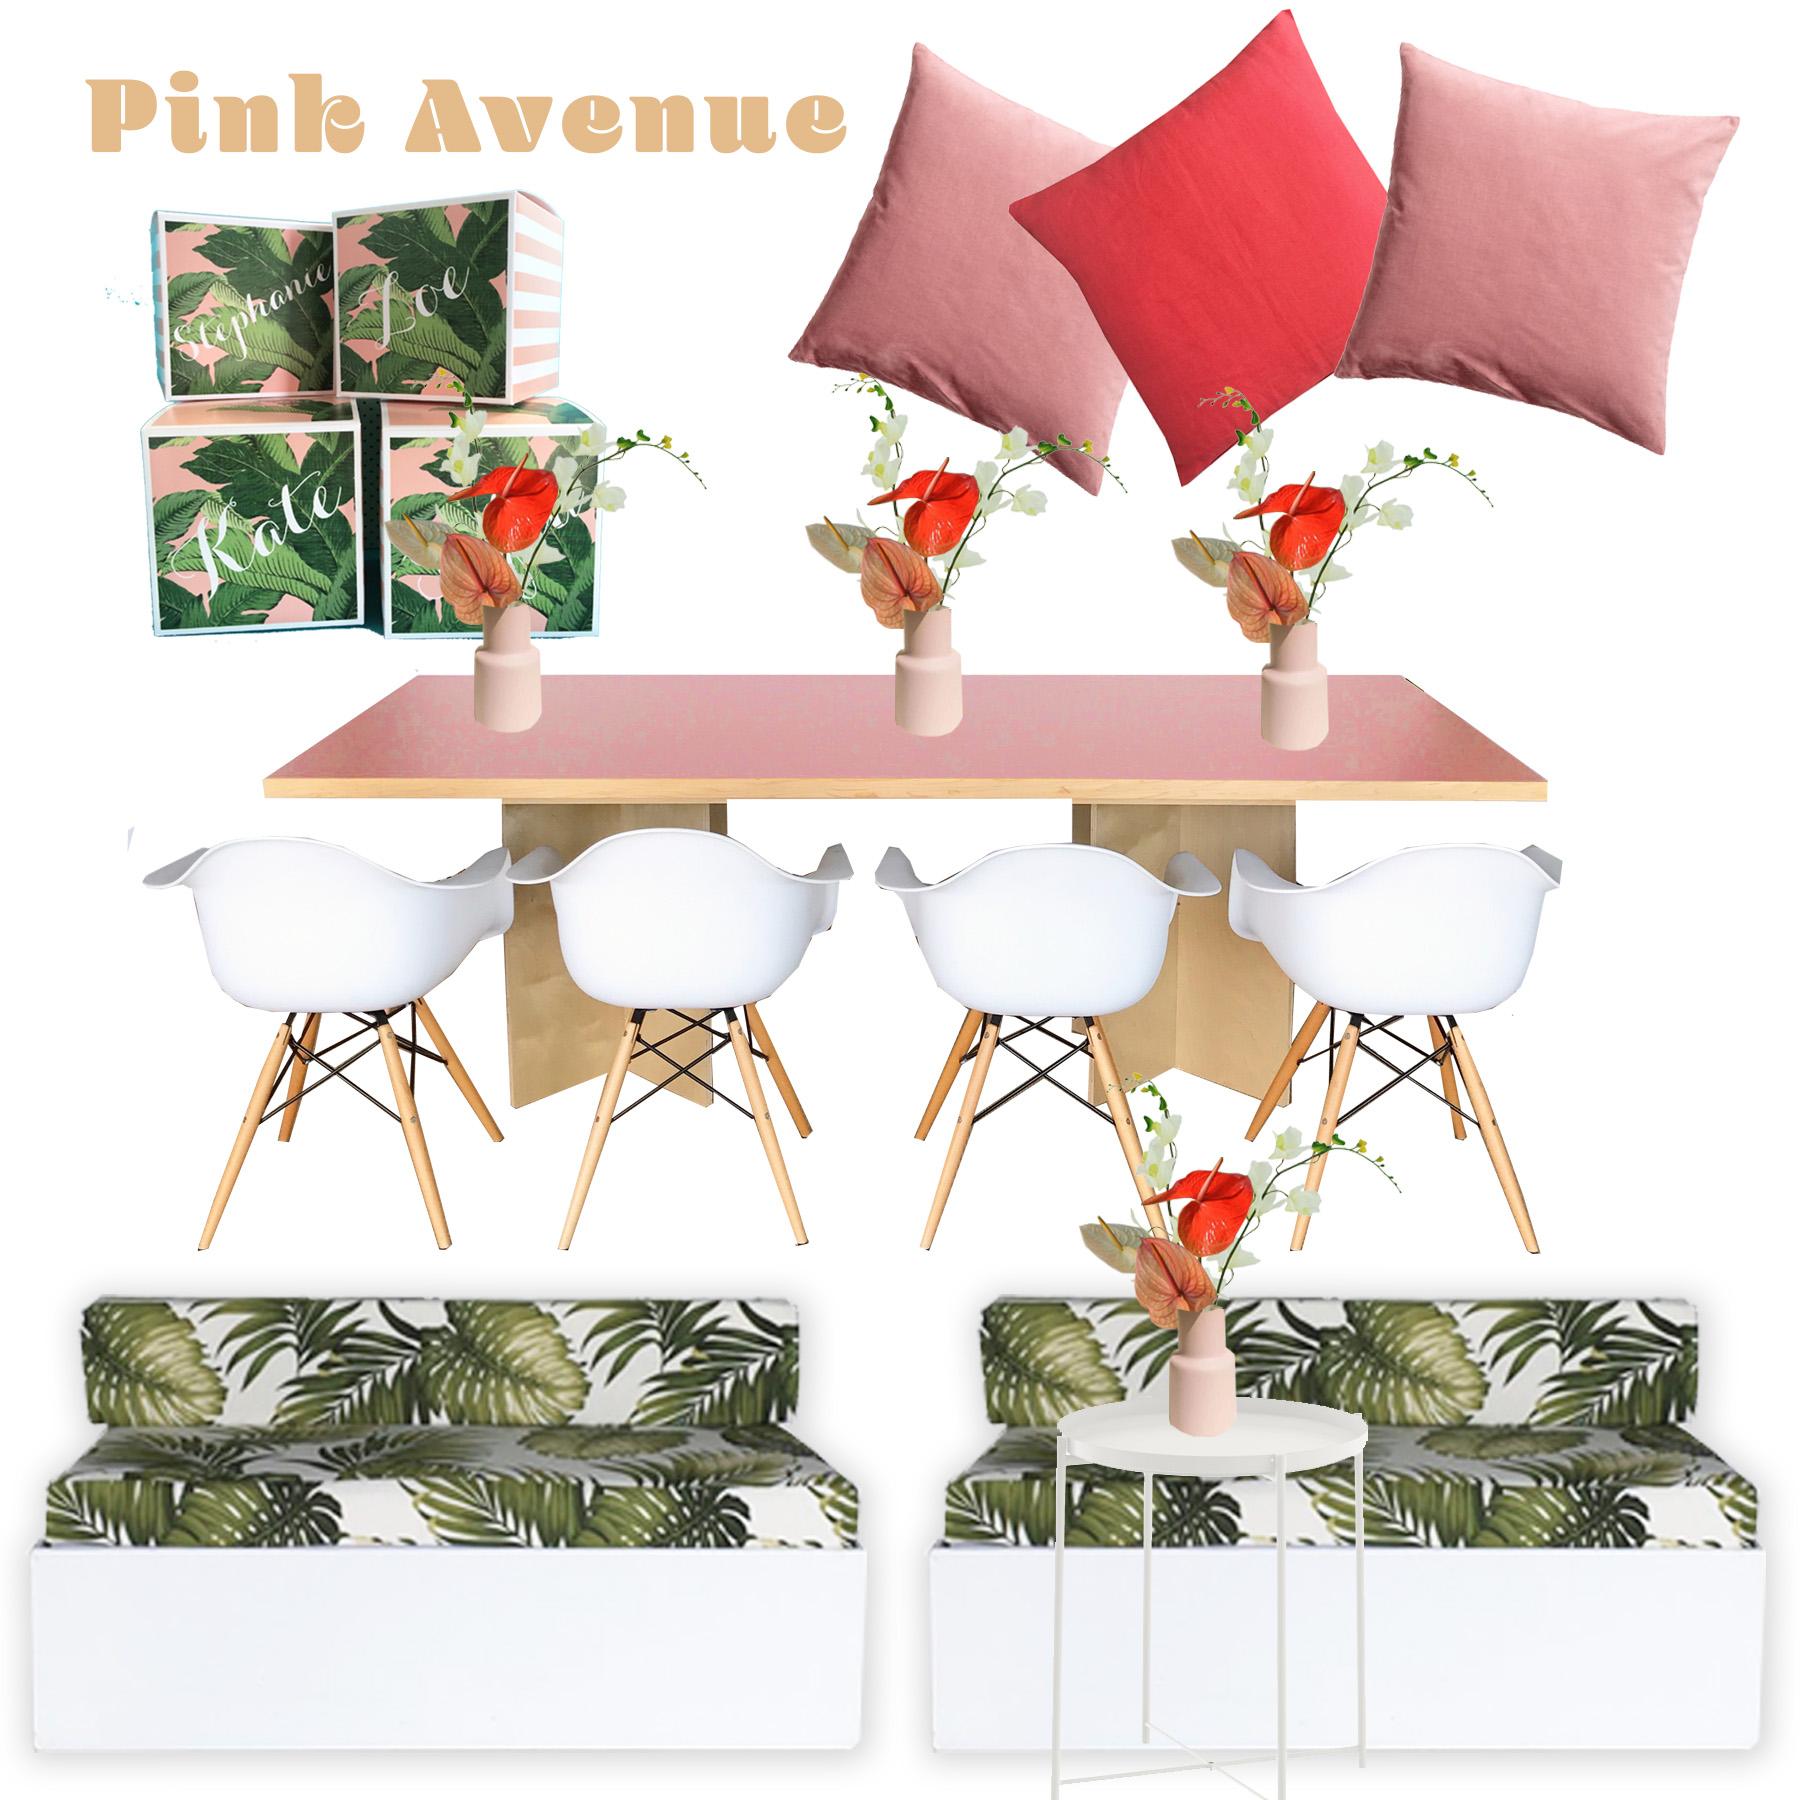 pink-avenue-furniture 3.jpg